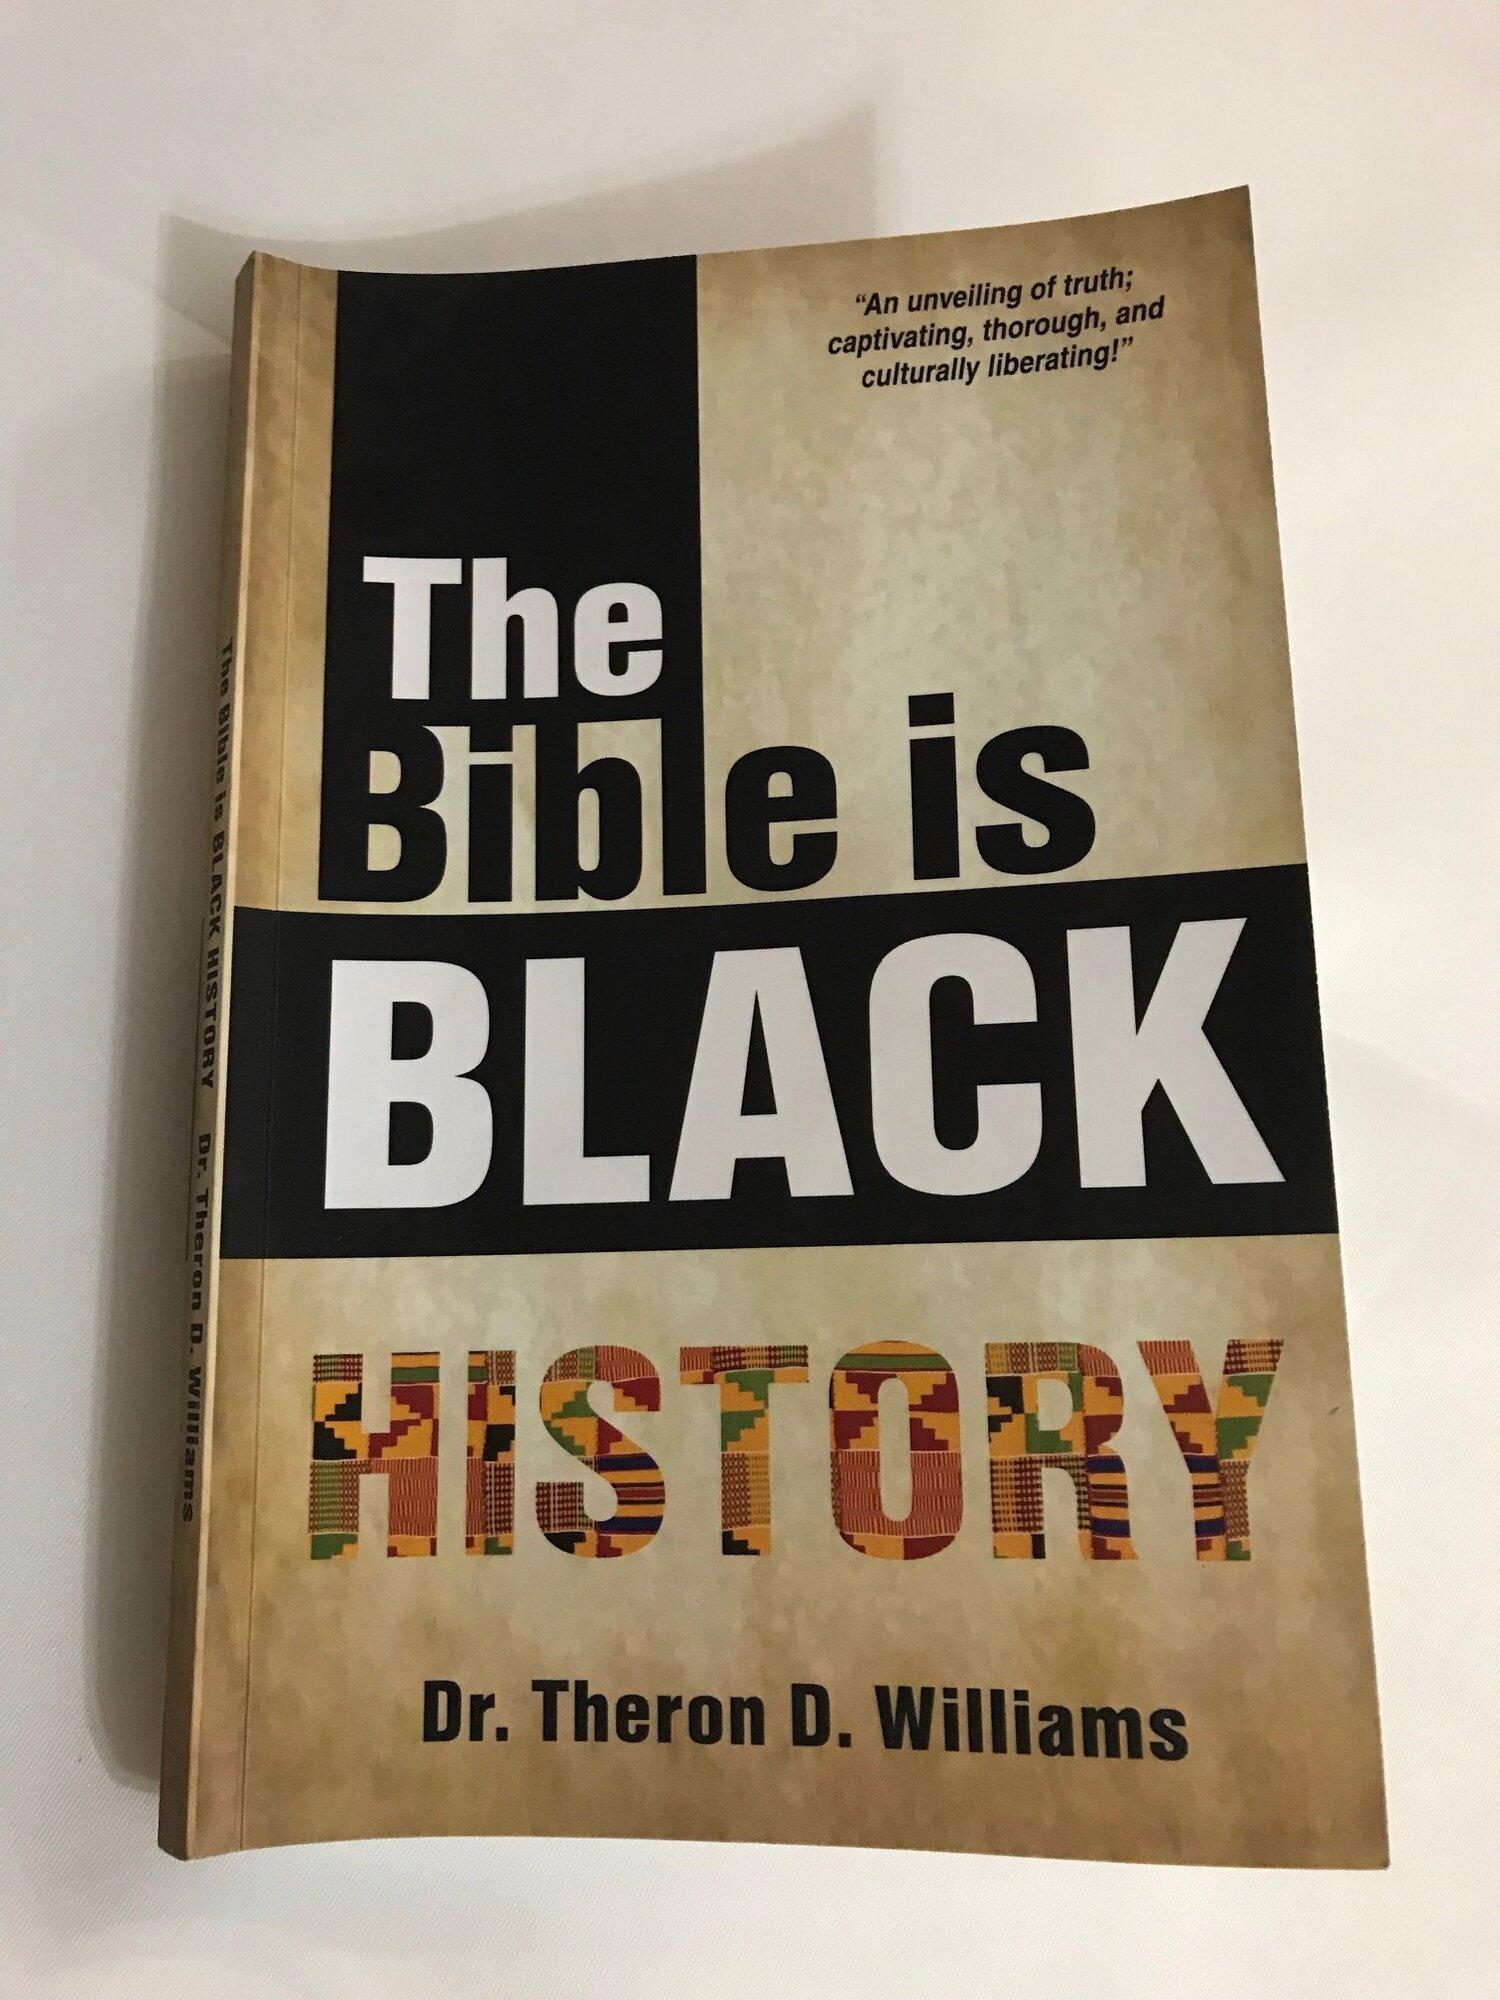 https://www.bibleisblackhistory.com/